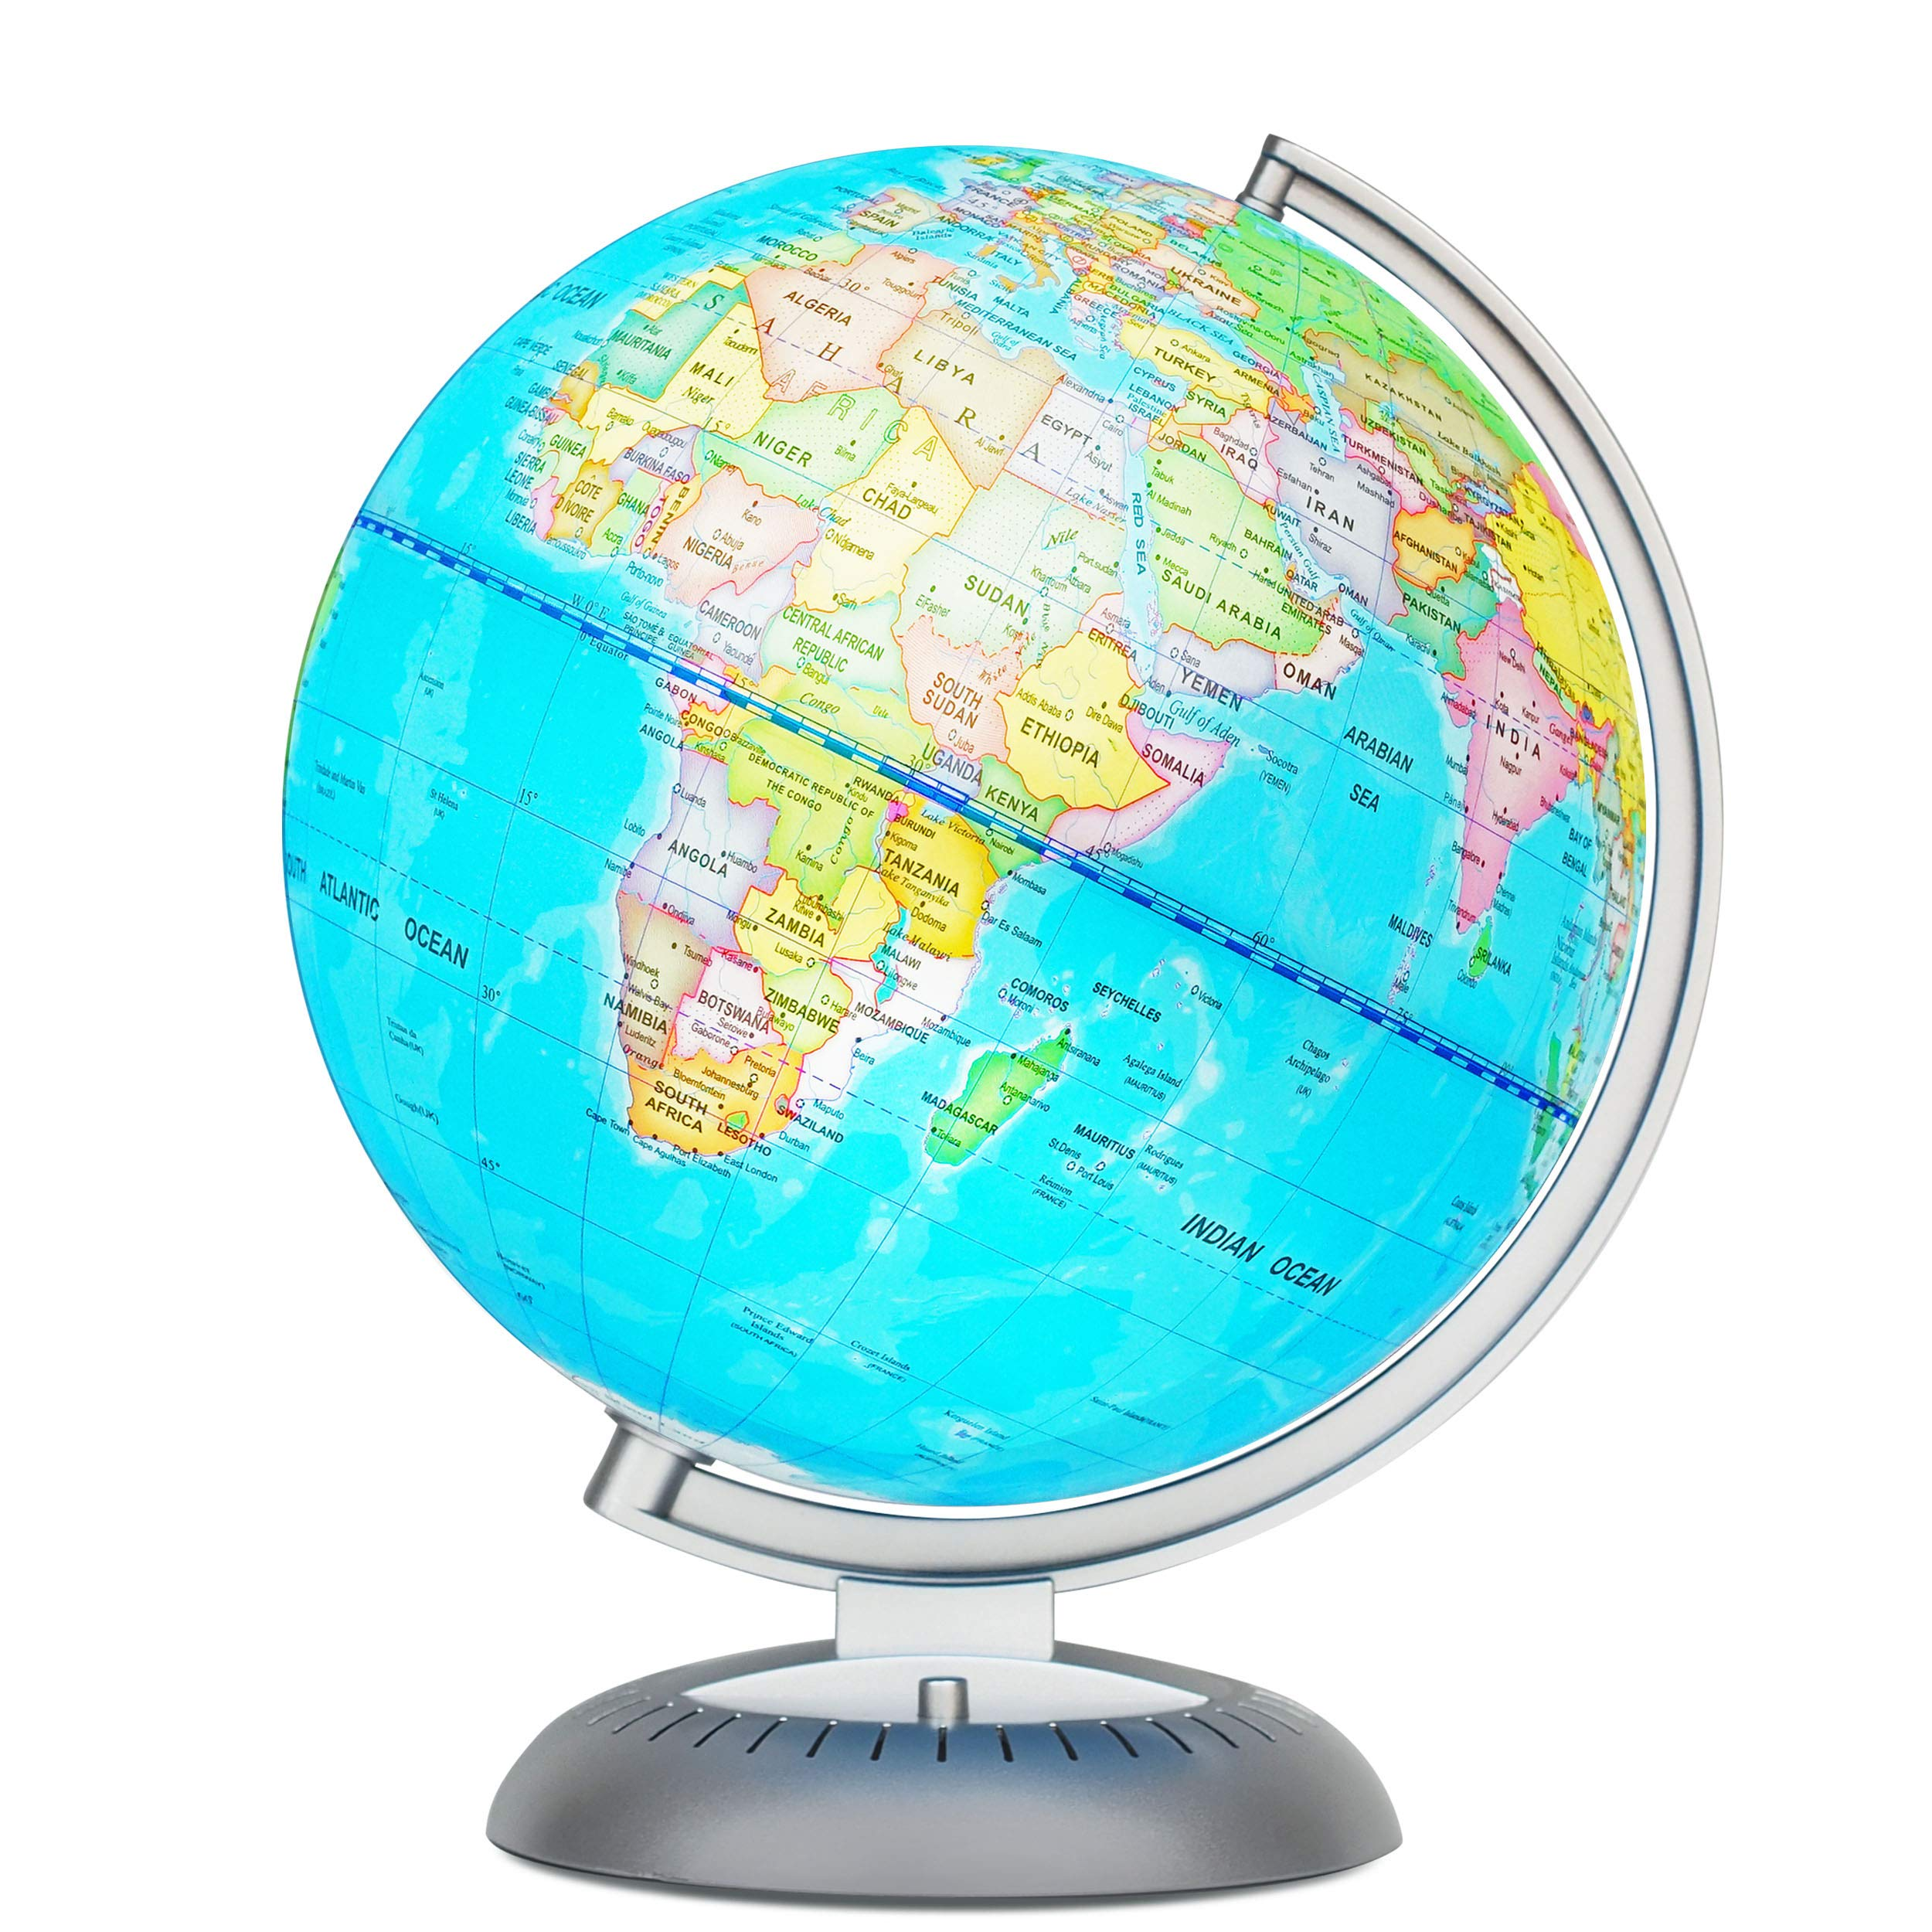 Illuminated World Globe Stand Built